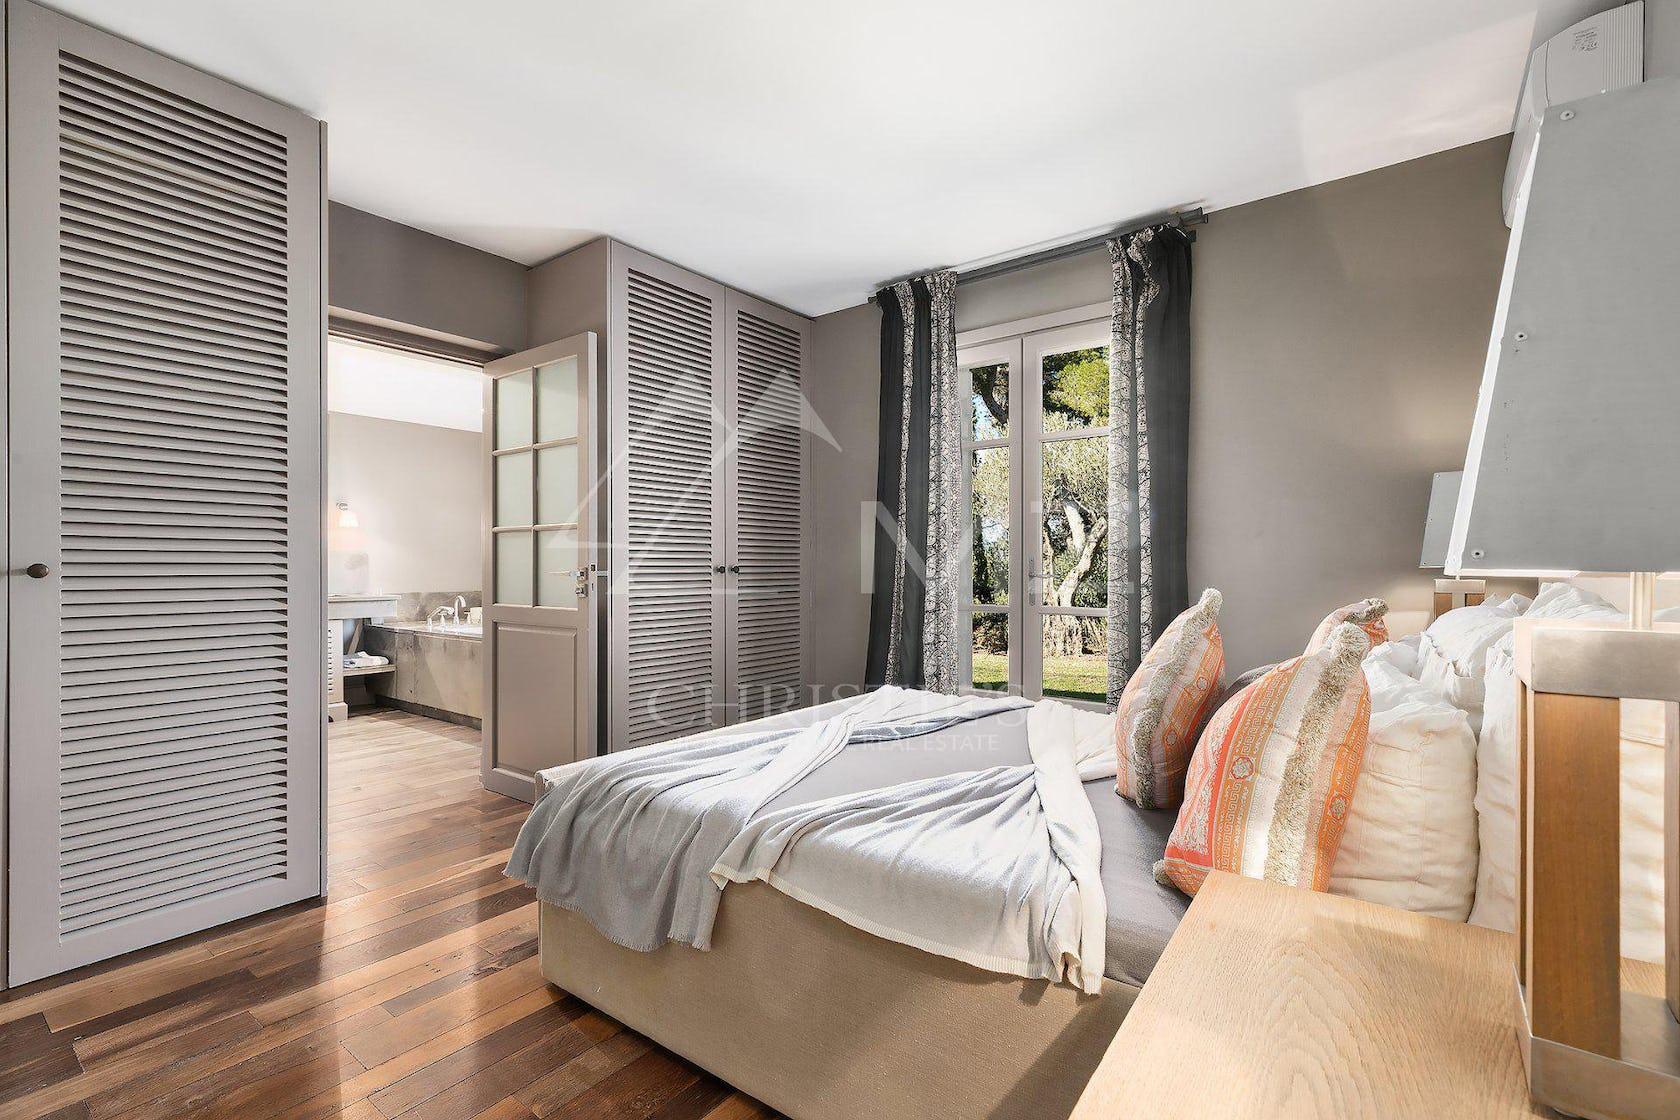 bedroom room indoors flooring furniture wood hardwood floor interior design dorm room